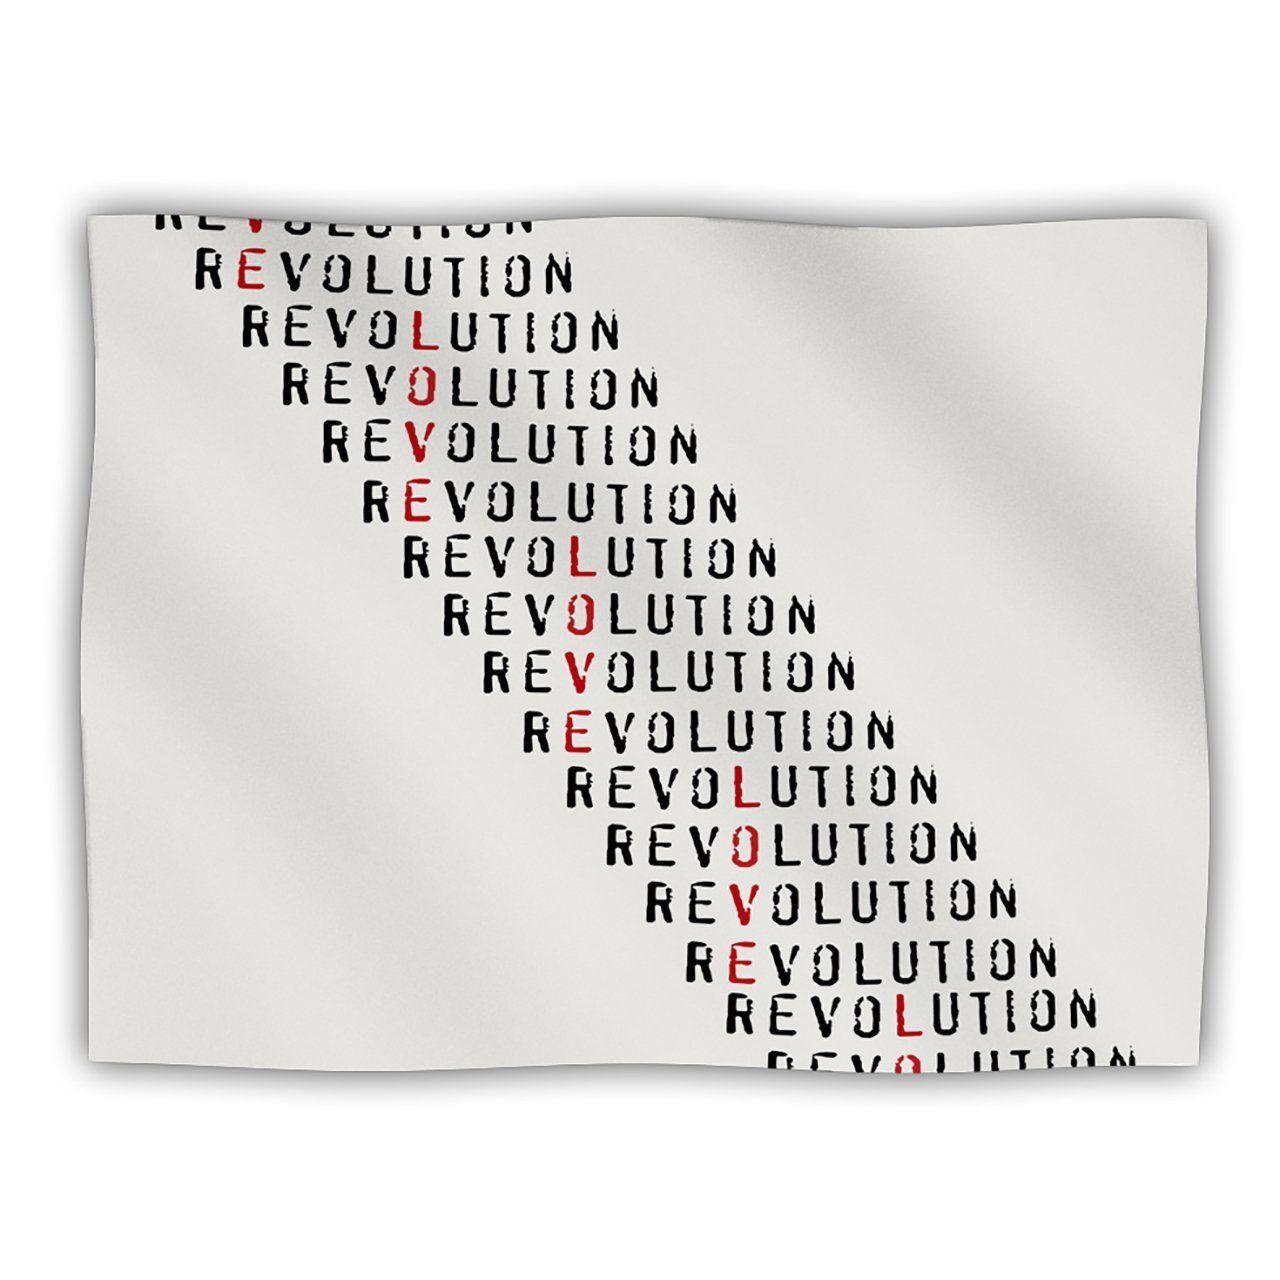 Kess InHouse Skye Zambrana 'Revolution' Pet Dog Blanket